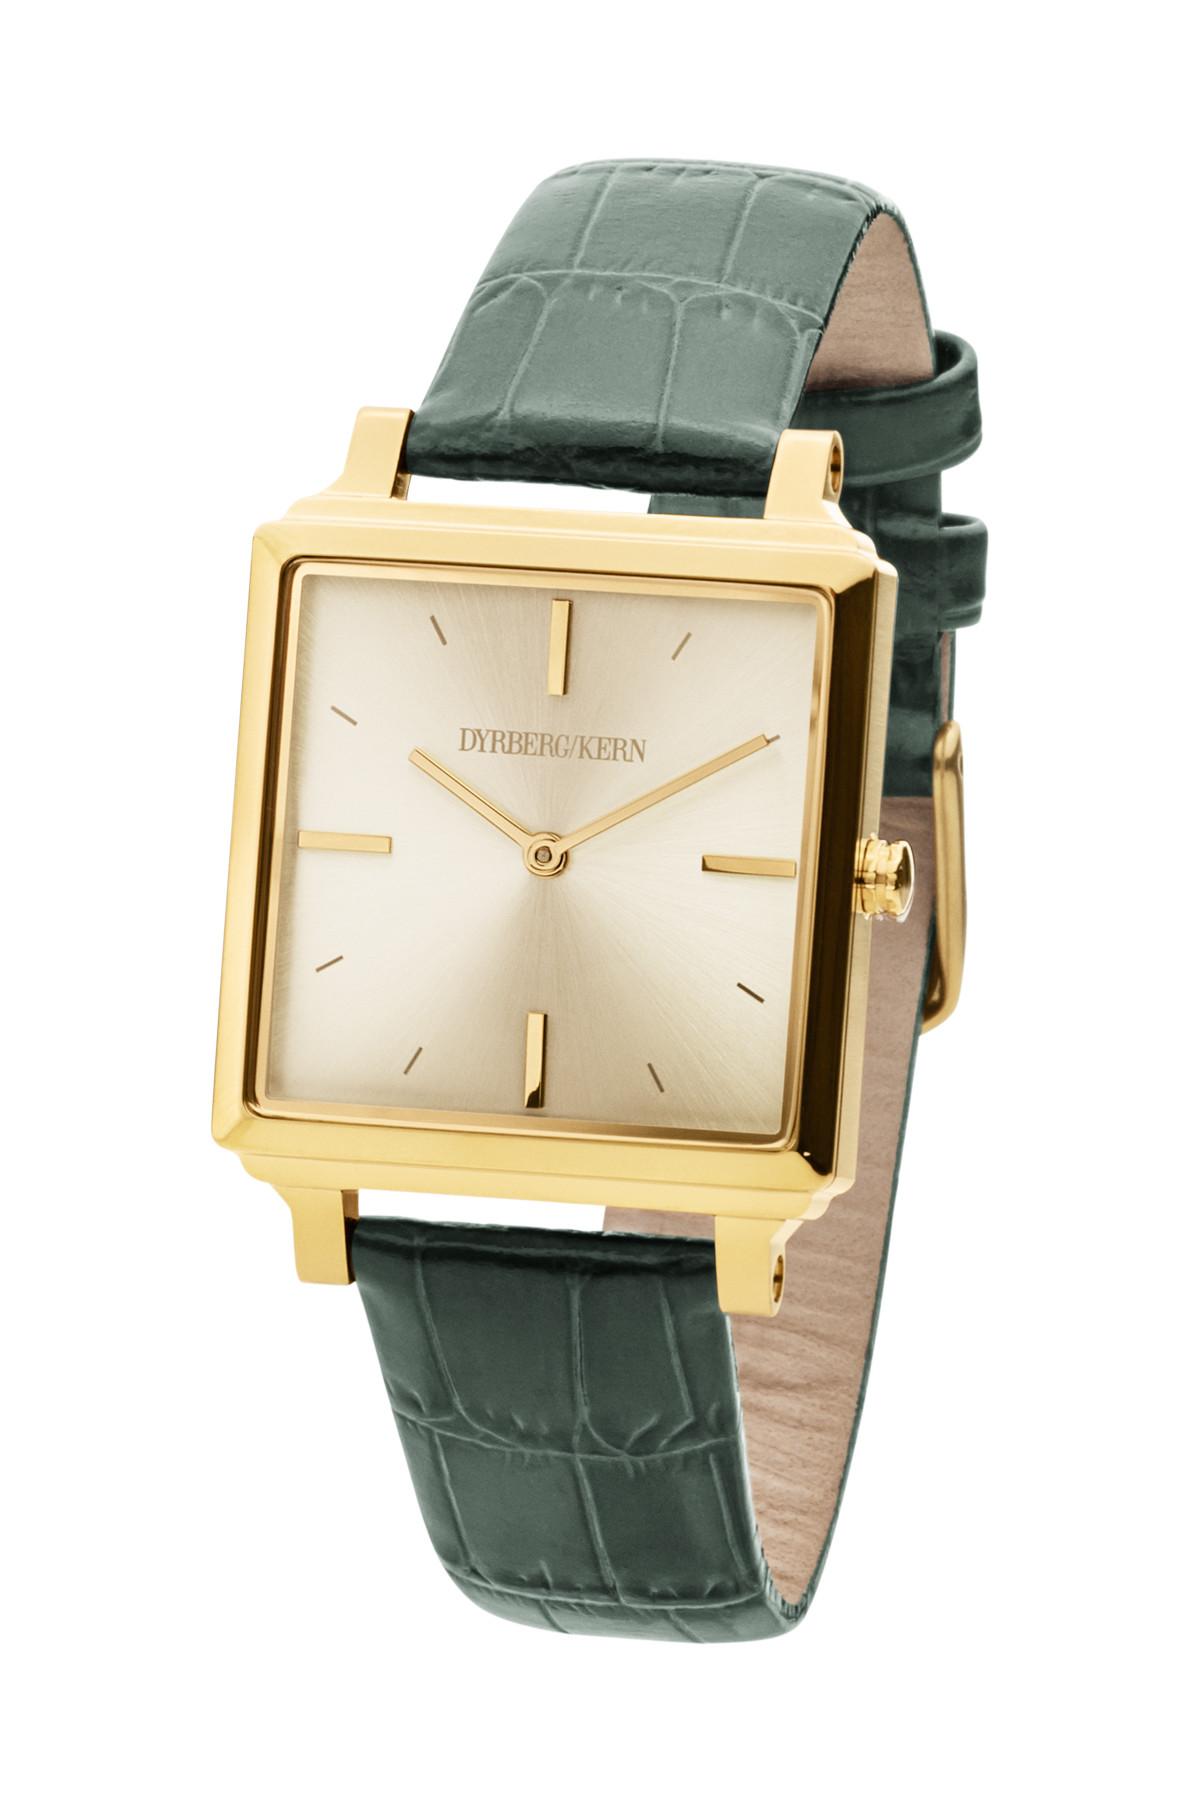 Image of   DYRBERG/KERN CARAT UR 350215 (Gold, Green, ONESIZE)